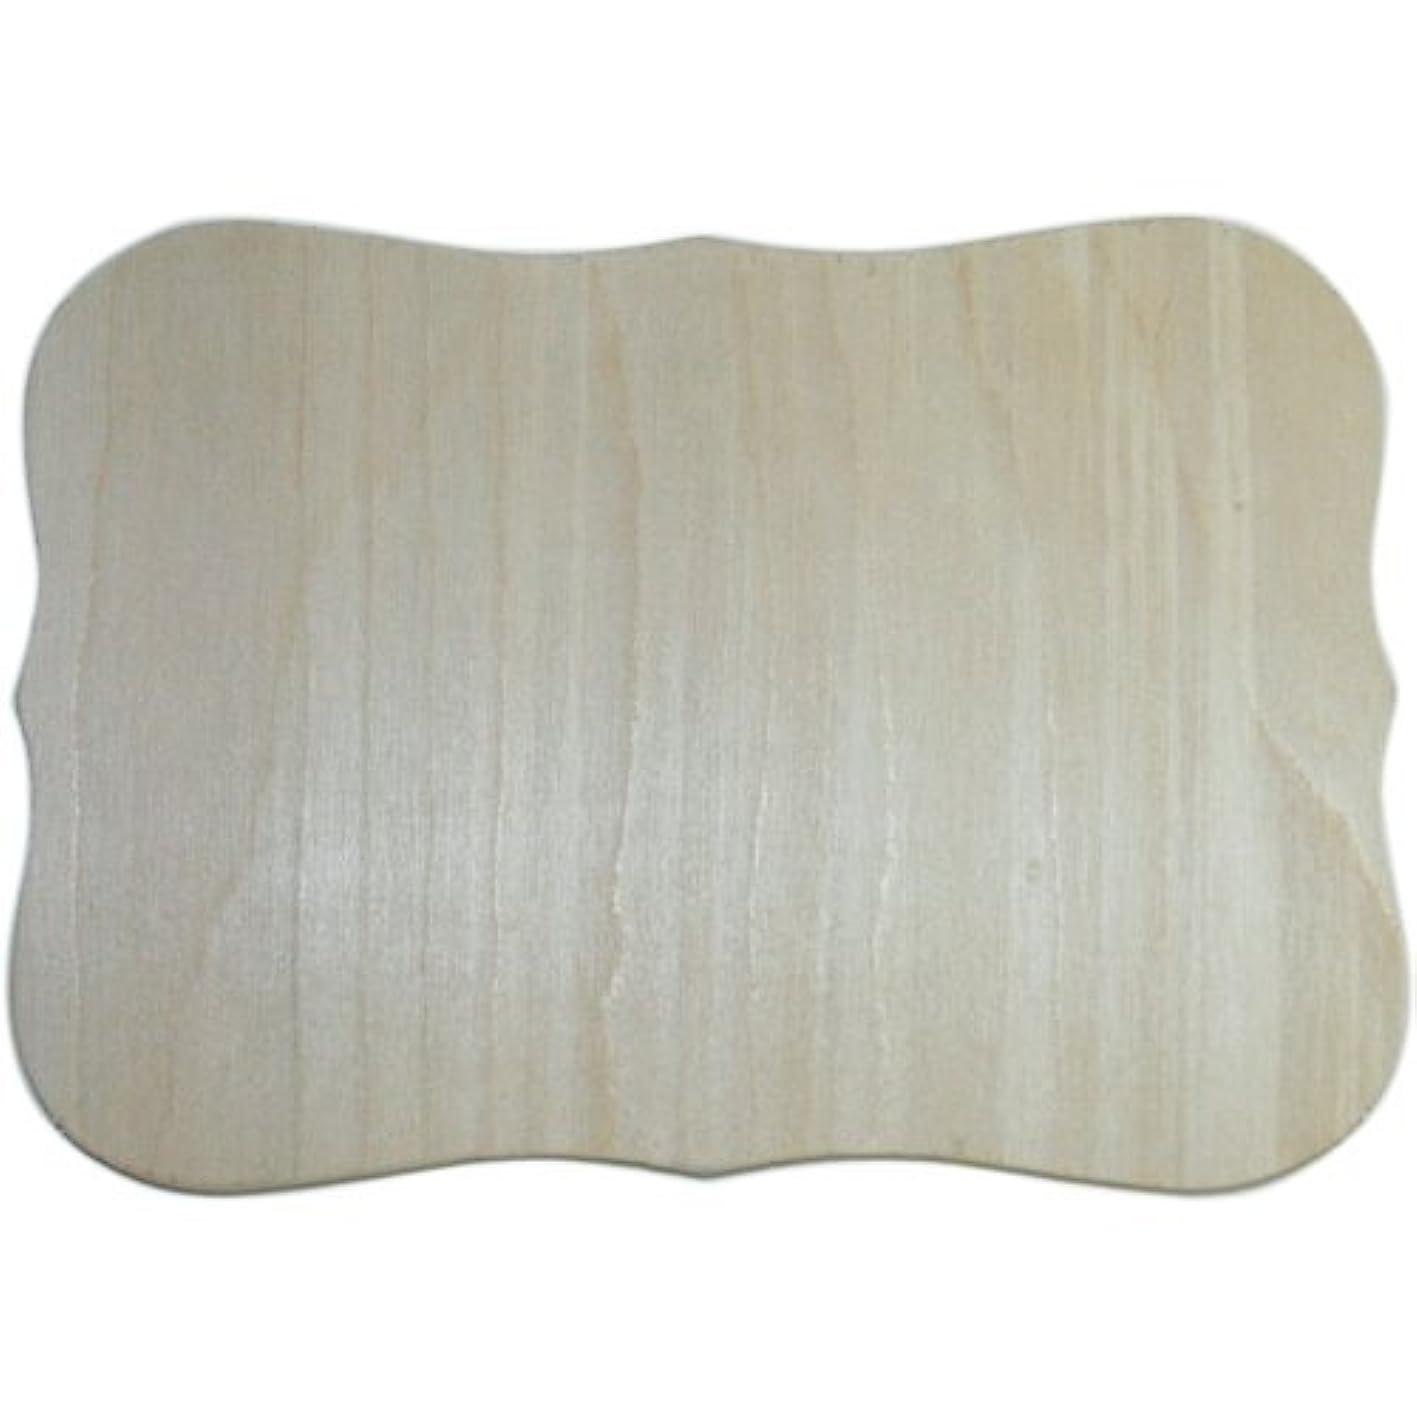 Bulk Buy: MPI Wood Unfinished Wood Baltic Birch Plaque 1/Pkg Roman 7.5in. x 10.5in. (3-Pack) ojduljiseko182